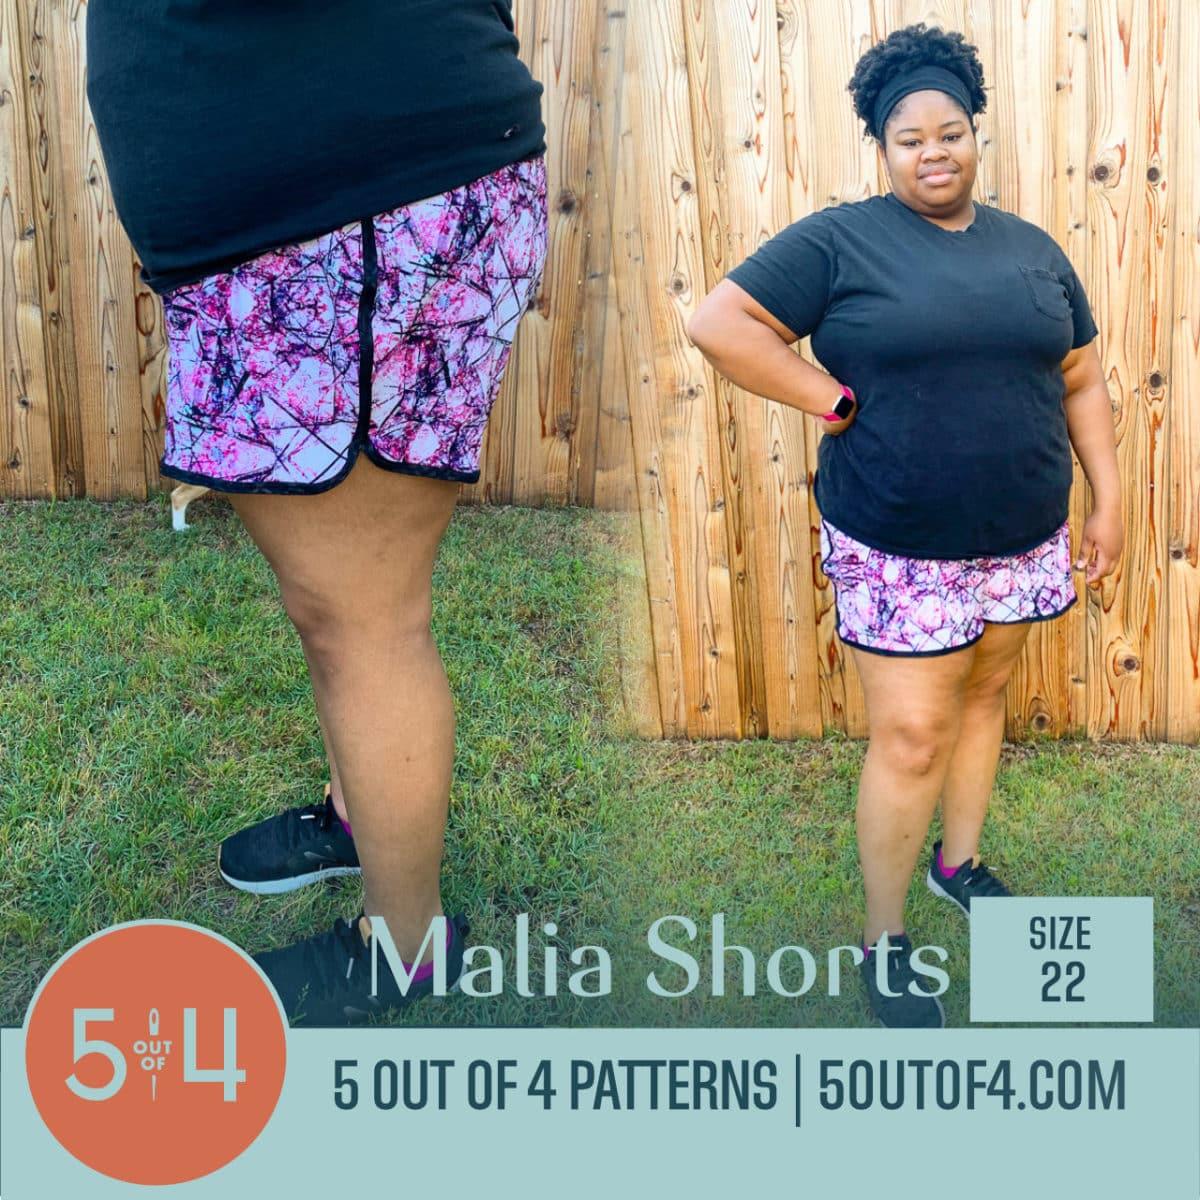 Malia Shorts Size 22